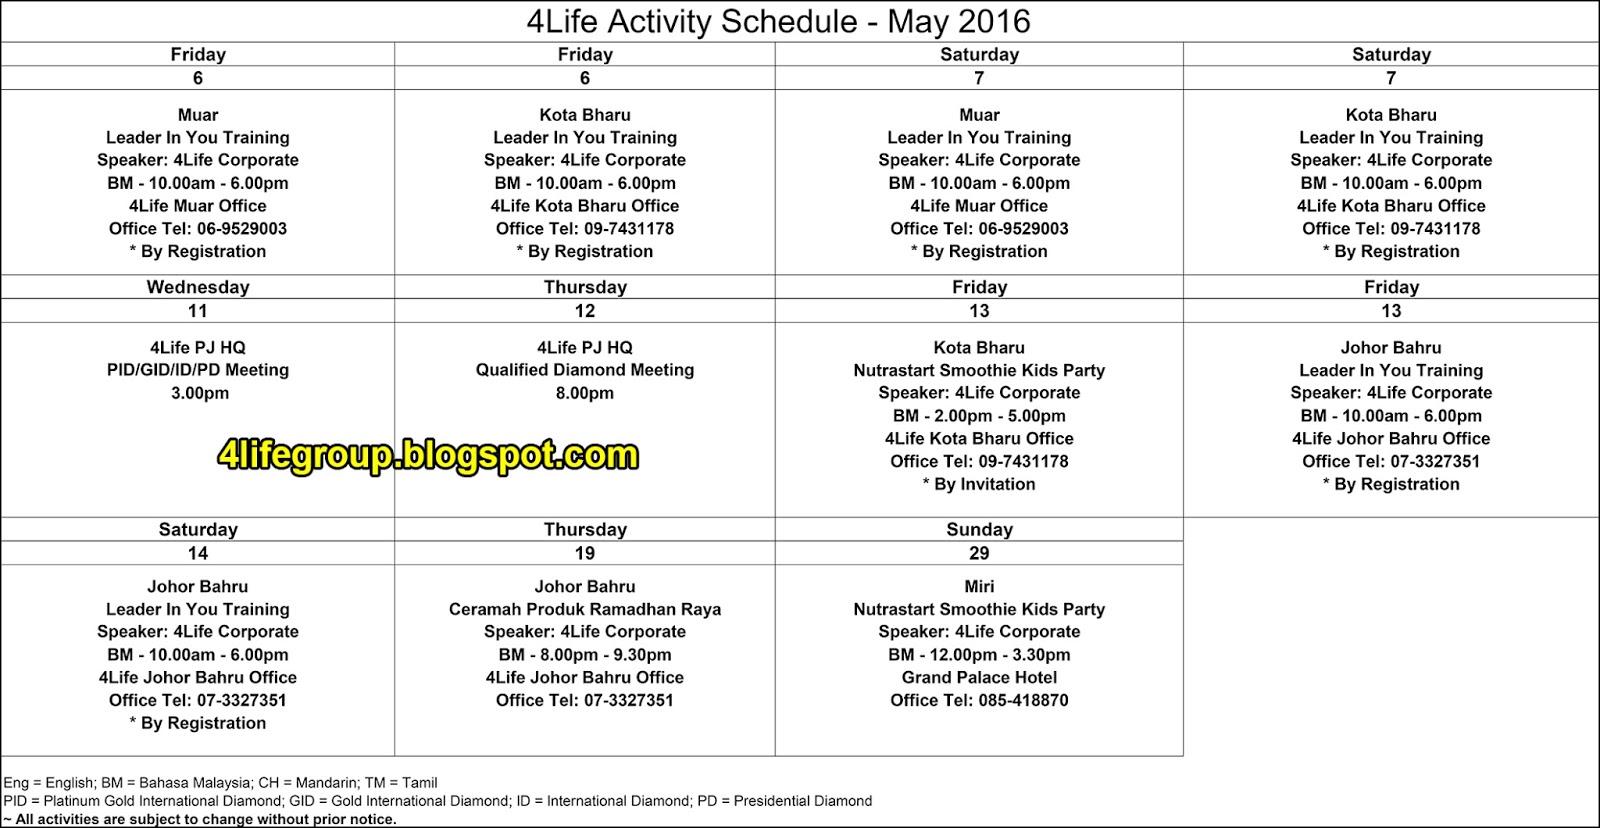 foto Jadual Aktiviti Bulanan Mei 2016 4Life Malaysia